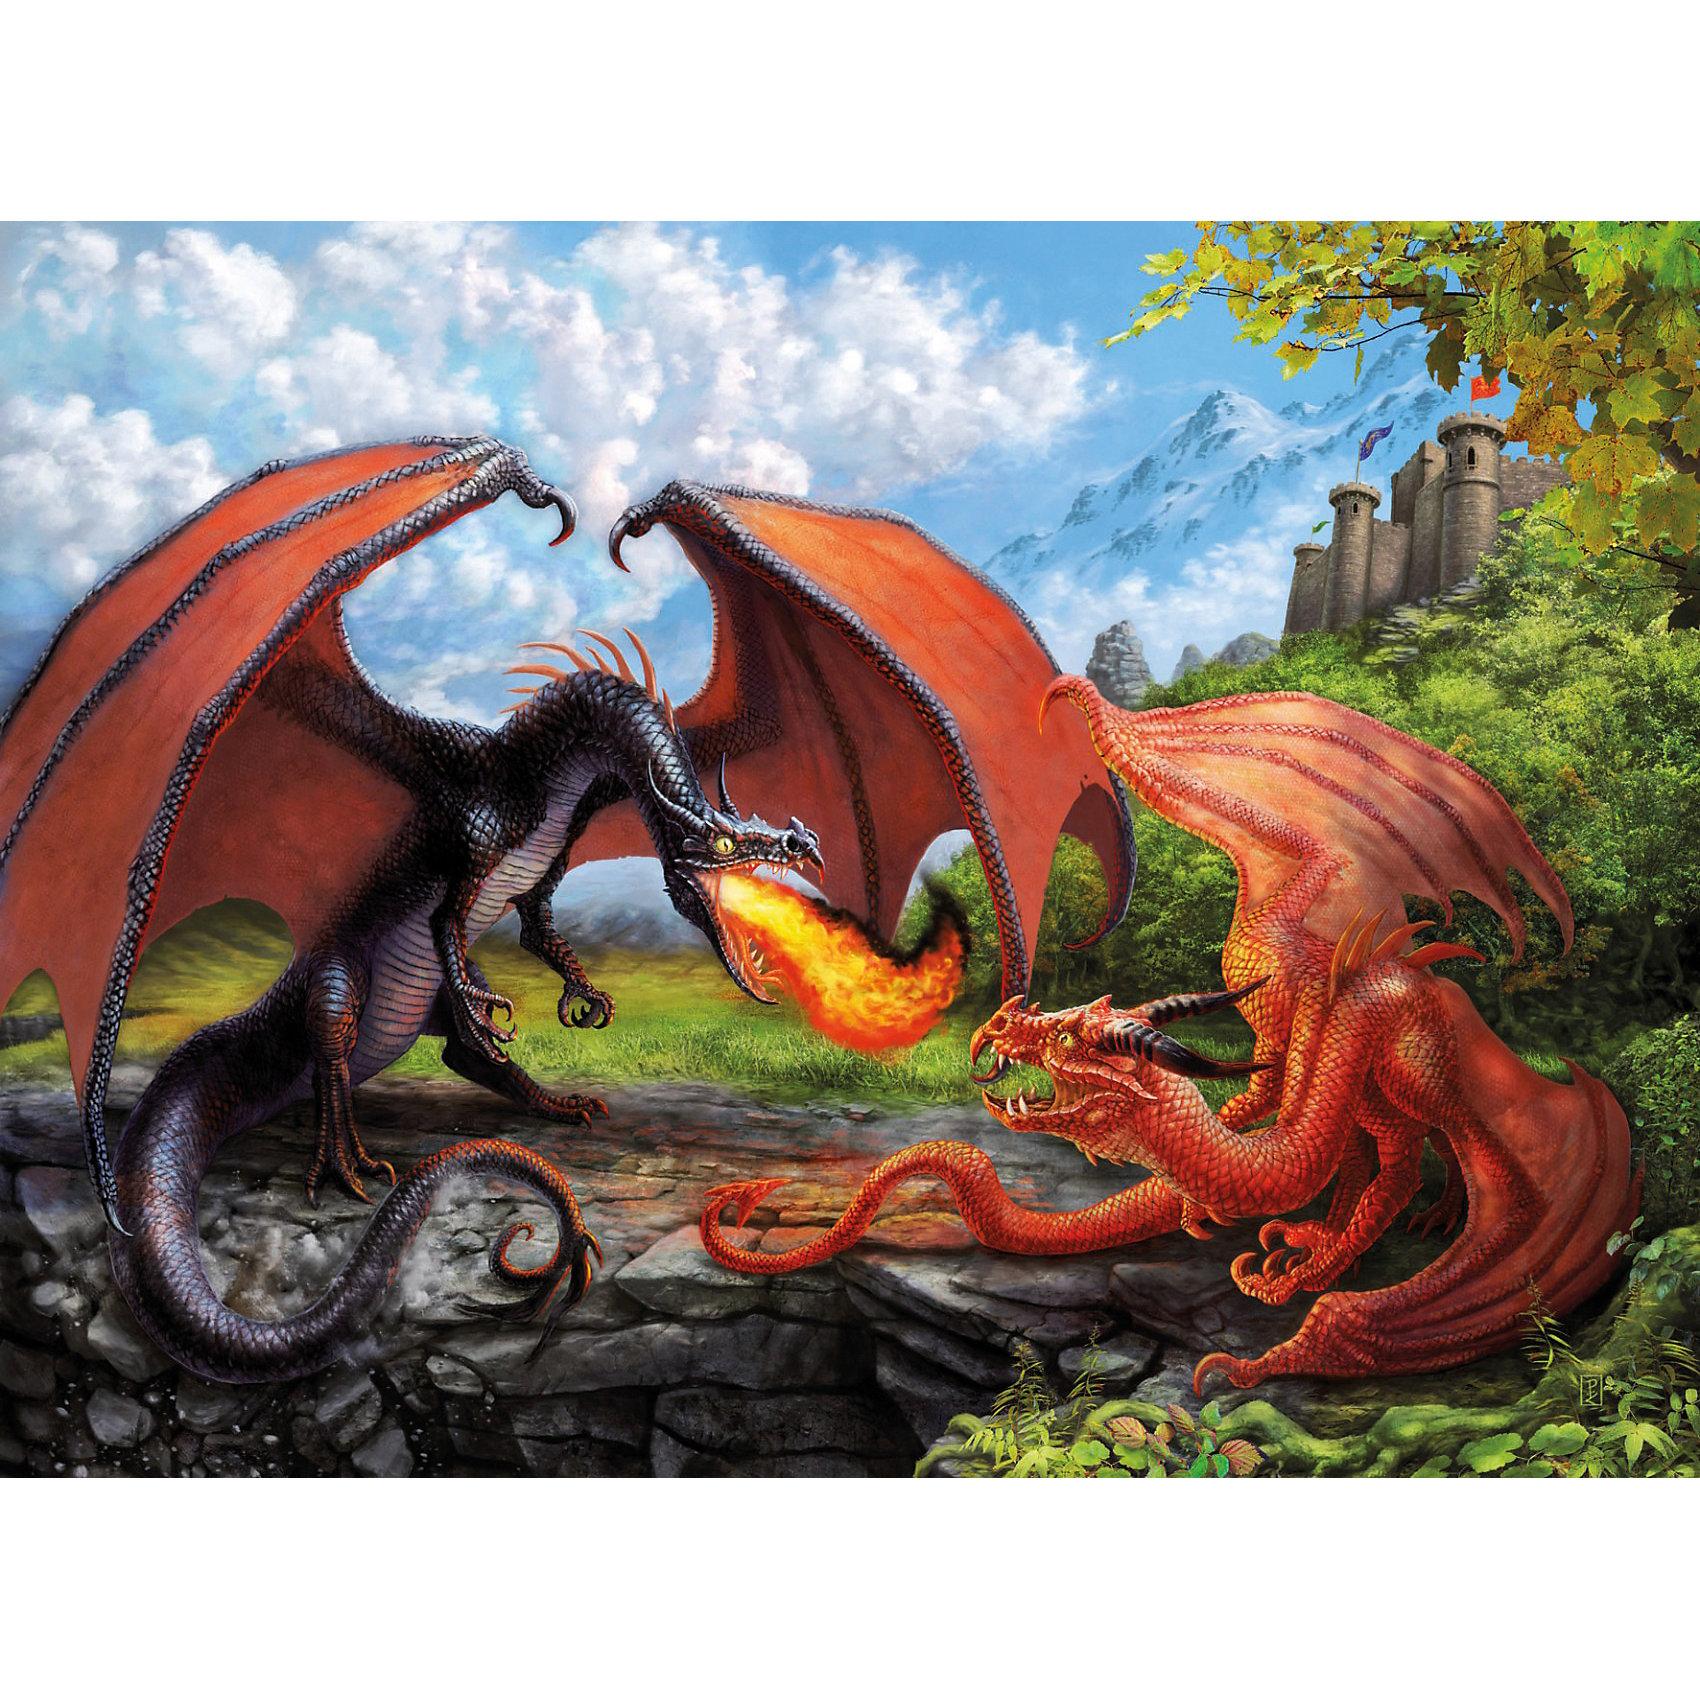 Пазл «Битва драконов» XXL 200 деталей, Ravensburger от myToys